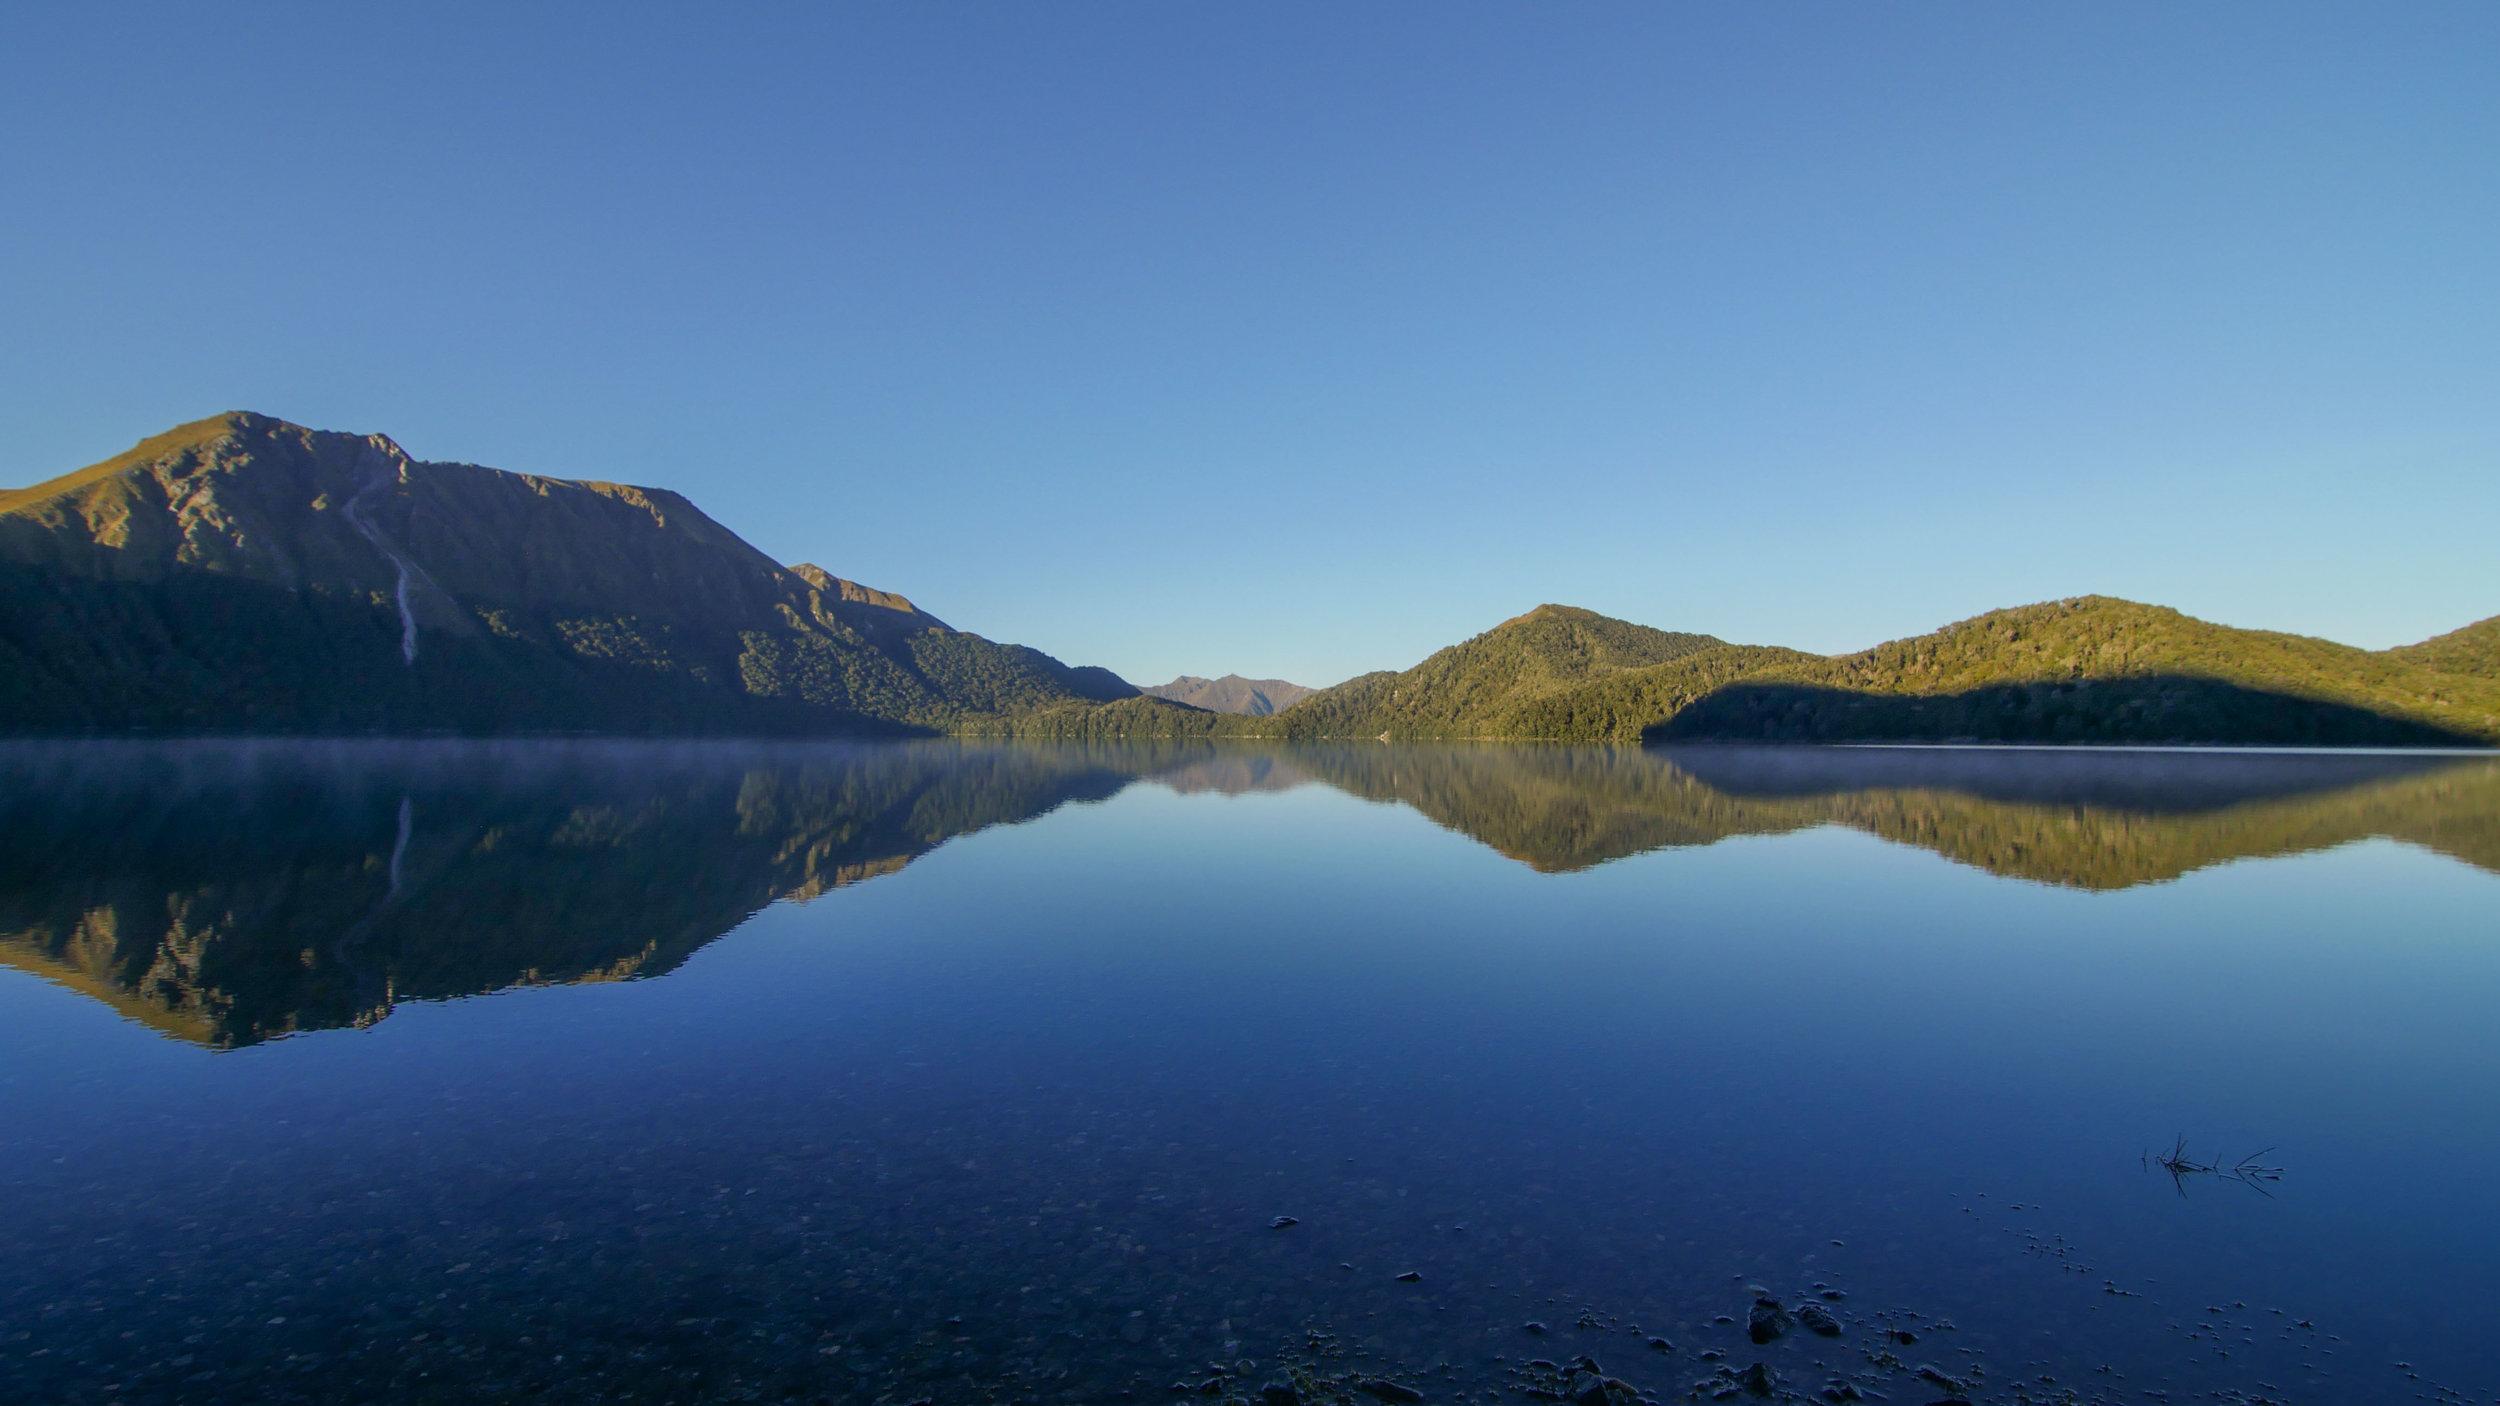 Green Lake Hut Lake Monowai Fiordland NAtional Park New Zealand (7 of 9).jpg